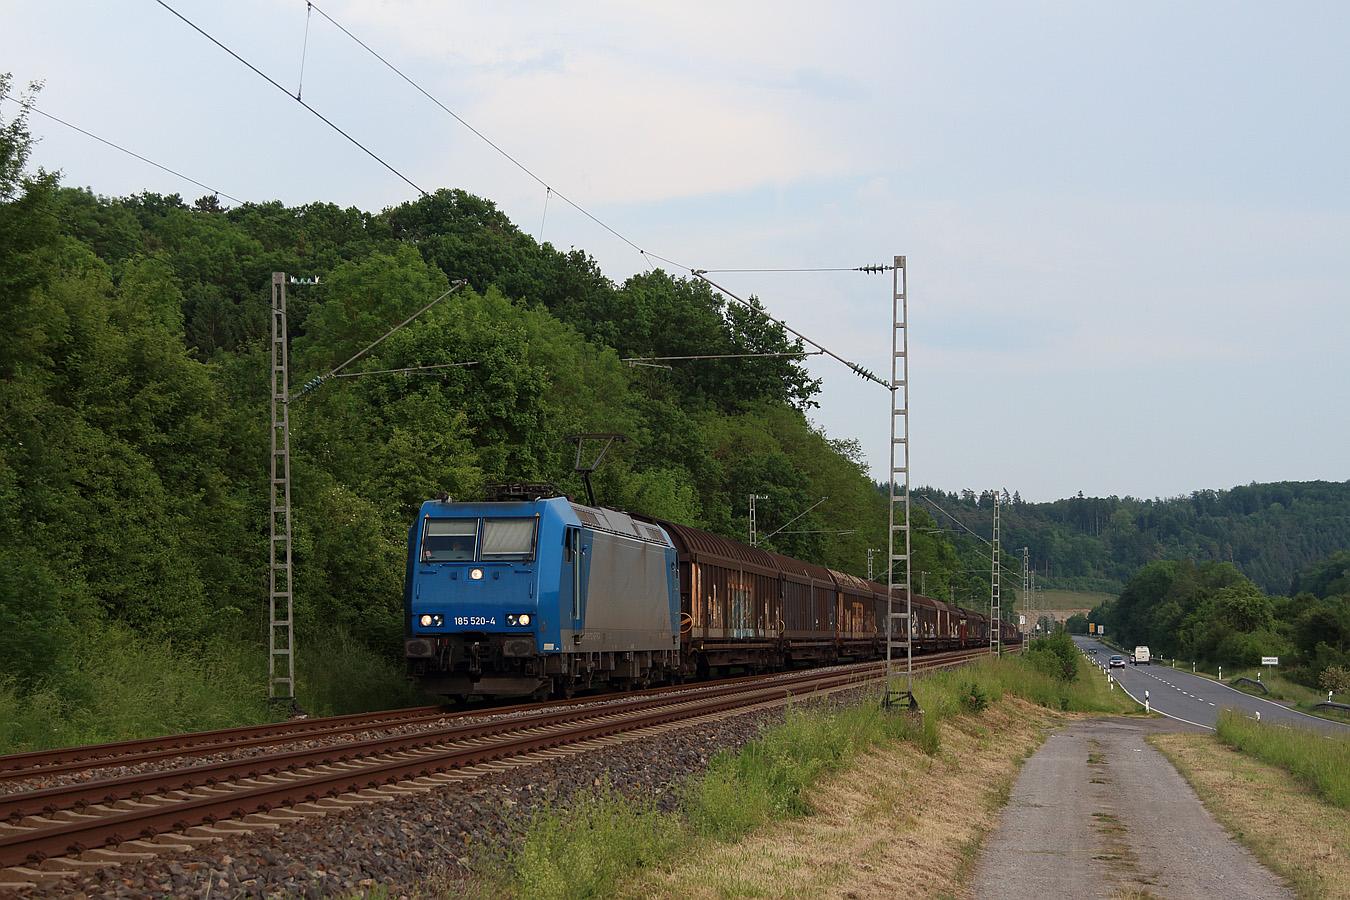 http://www.eisenbahnfotos-online.de/webspace/185520cfl-290517-rzim-1350.jpg